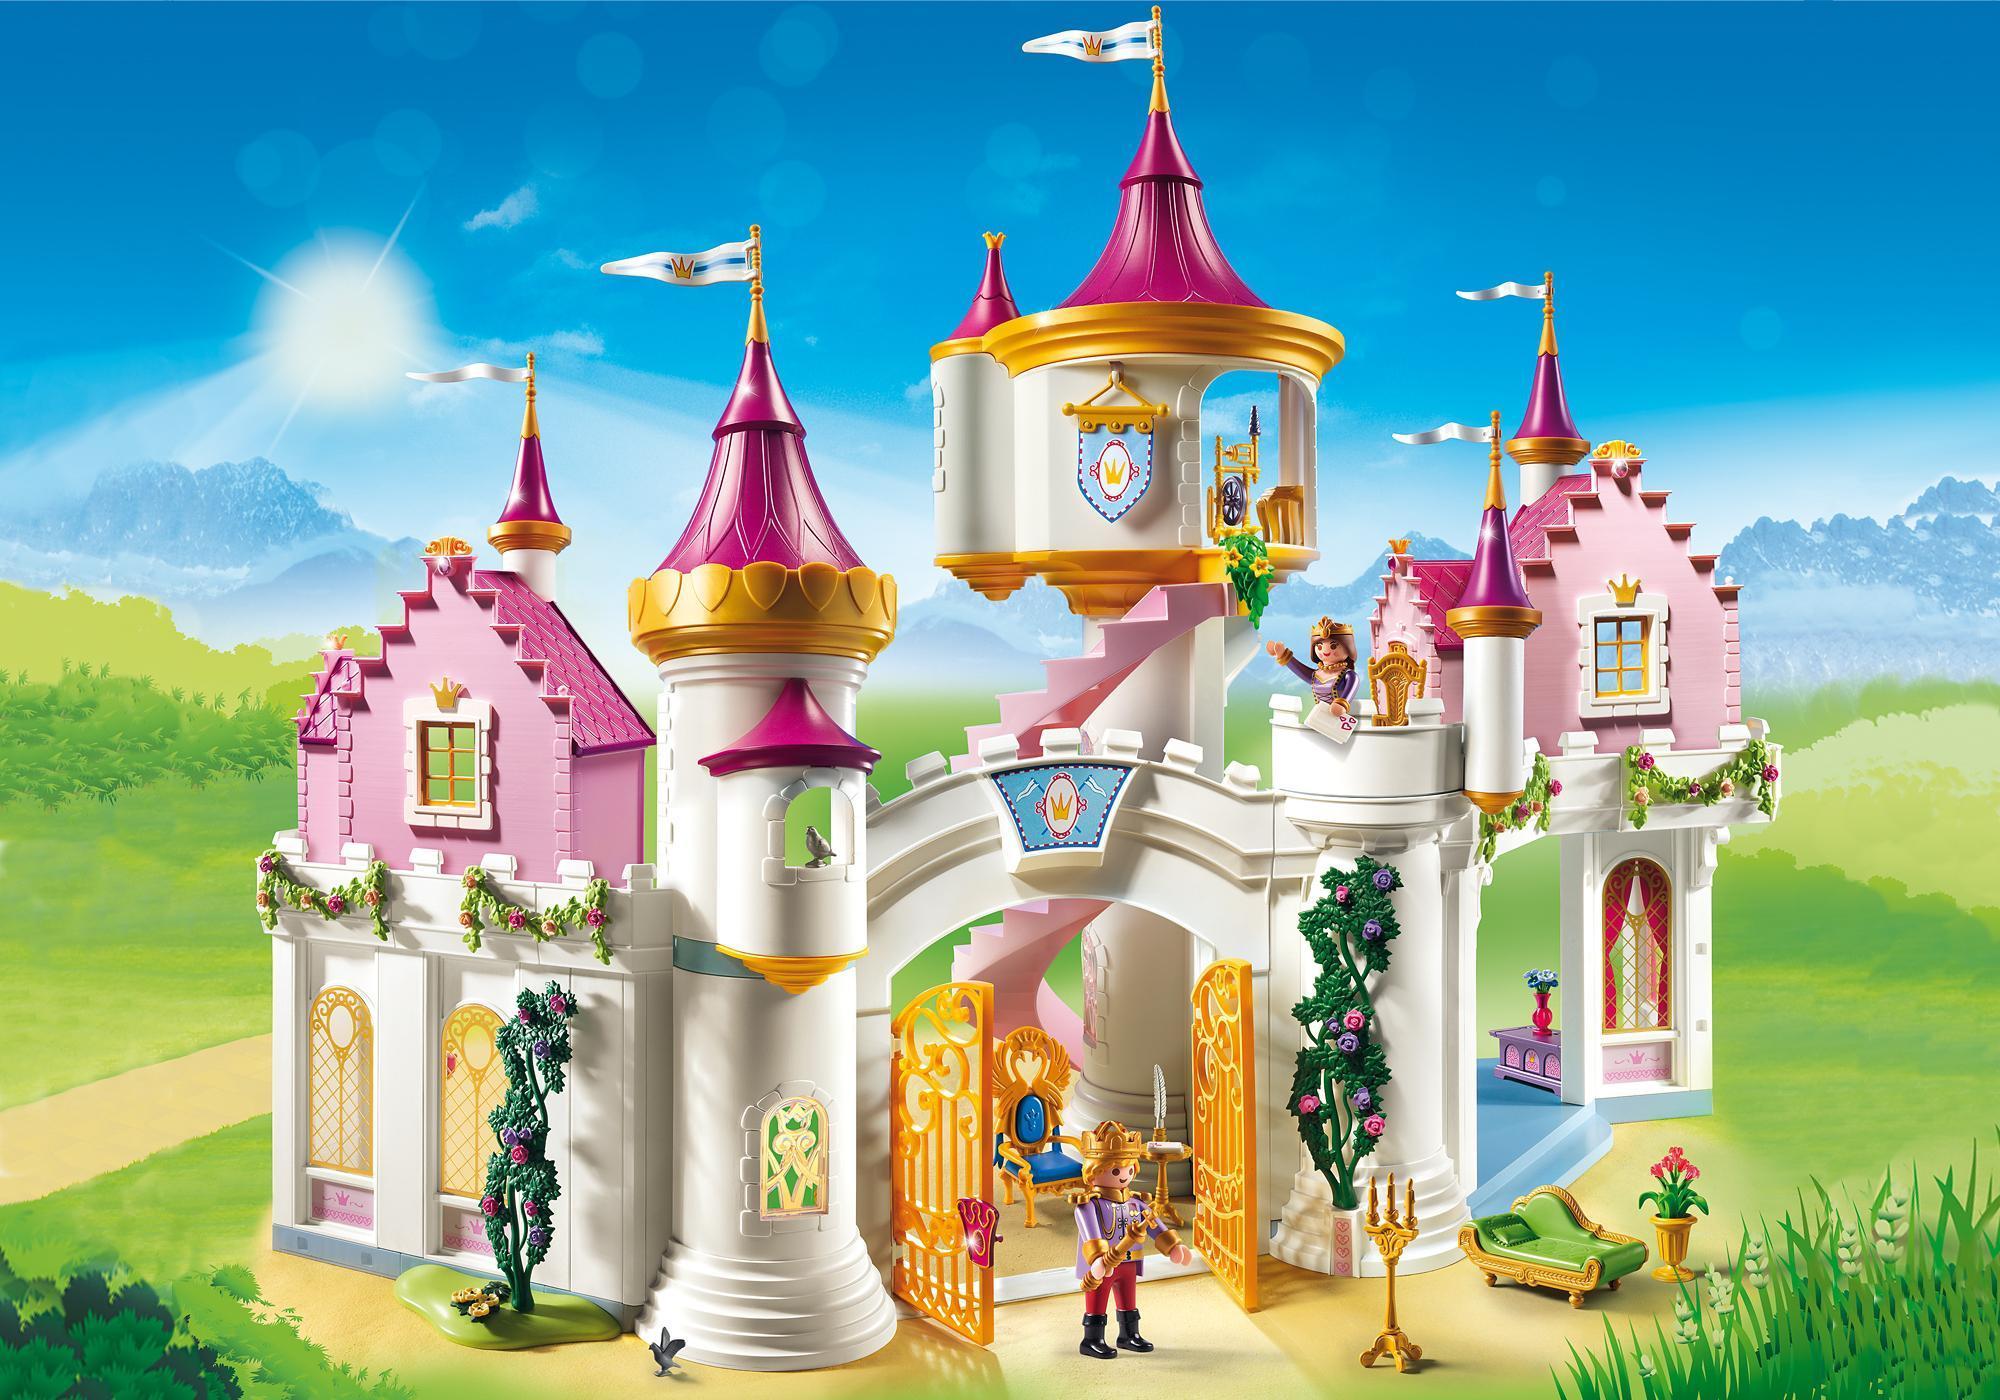 http://media.playmobil.com/i/playmobil/6848_product_detail/Замок Принцессы: Большой Замок Принцессы